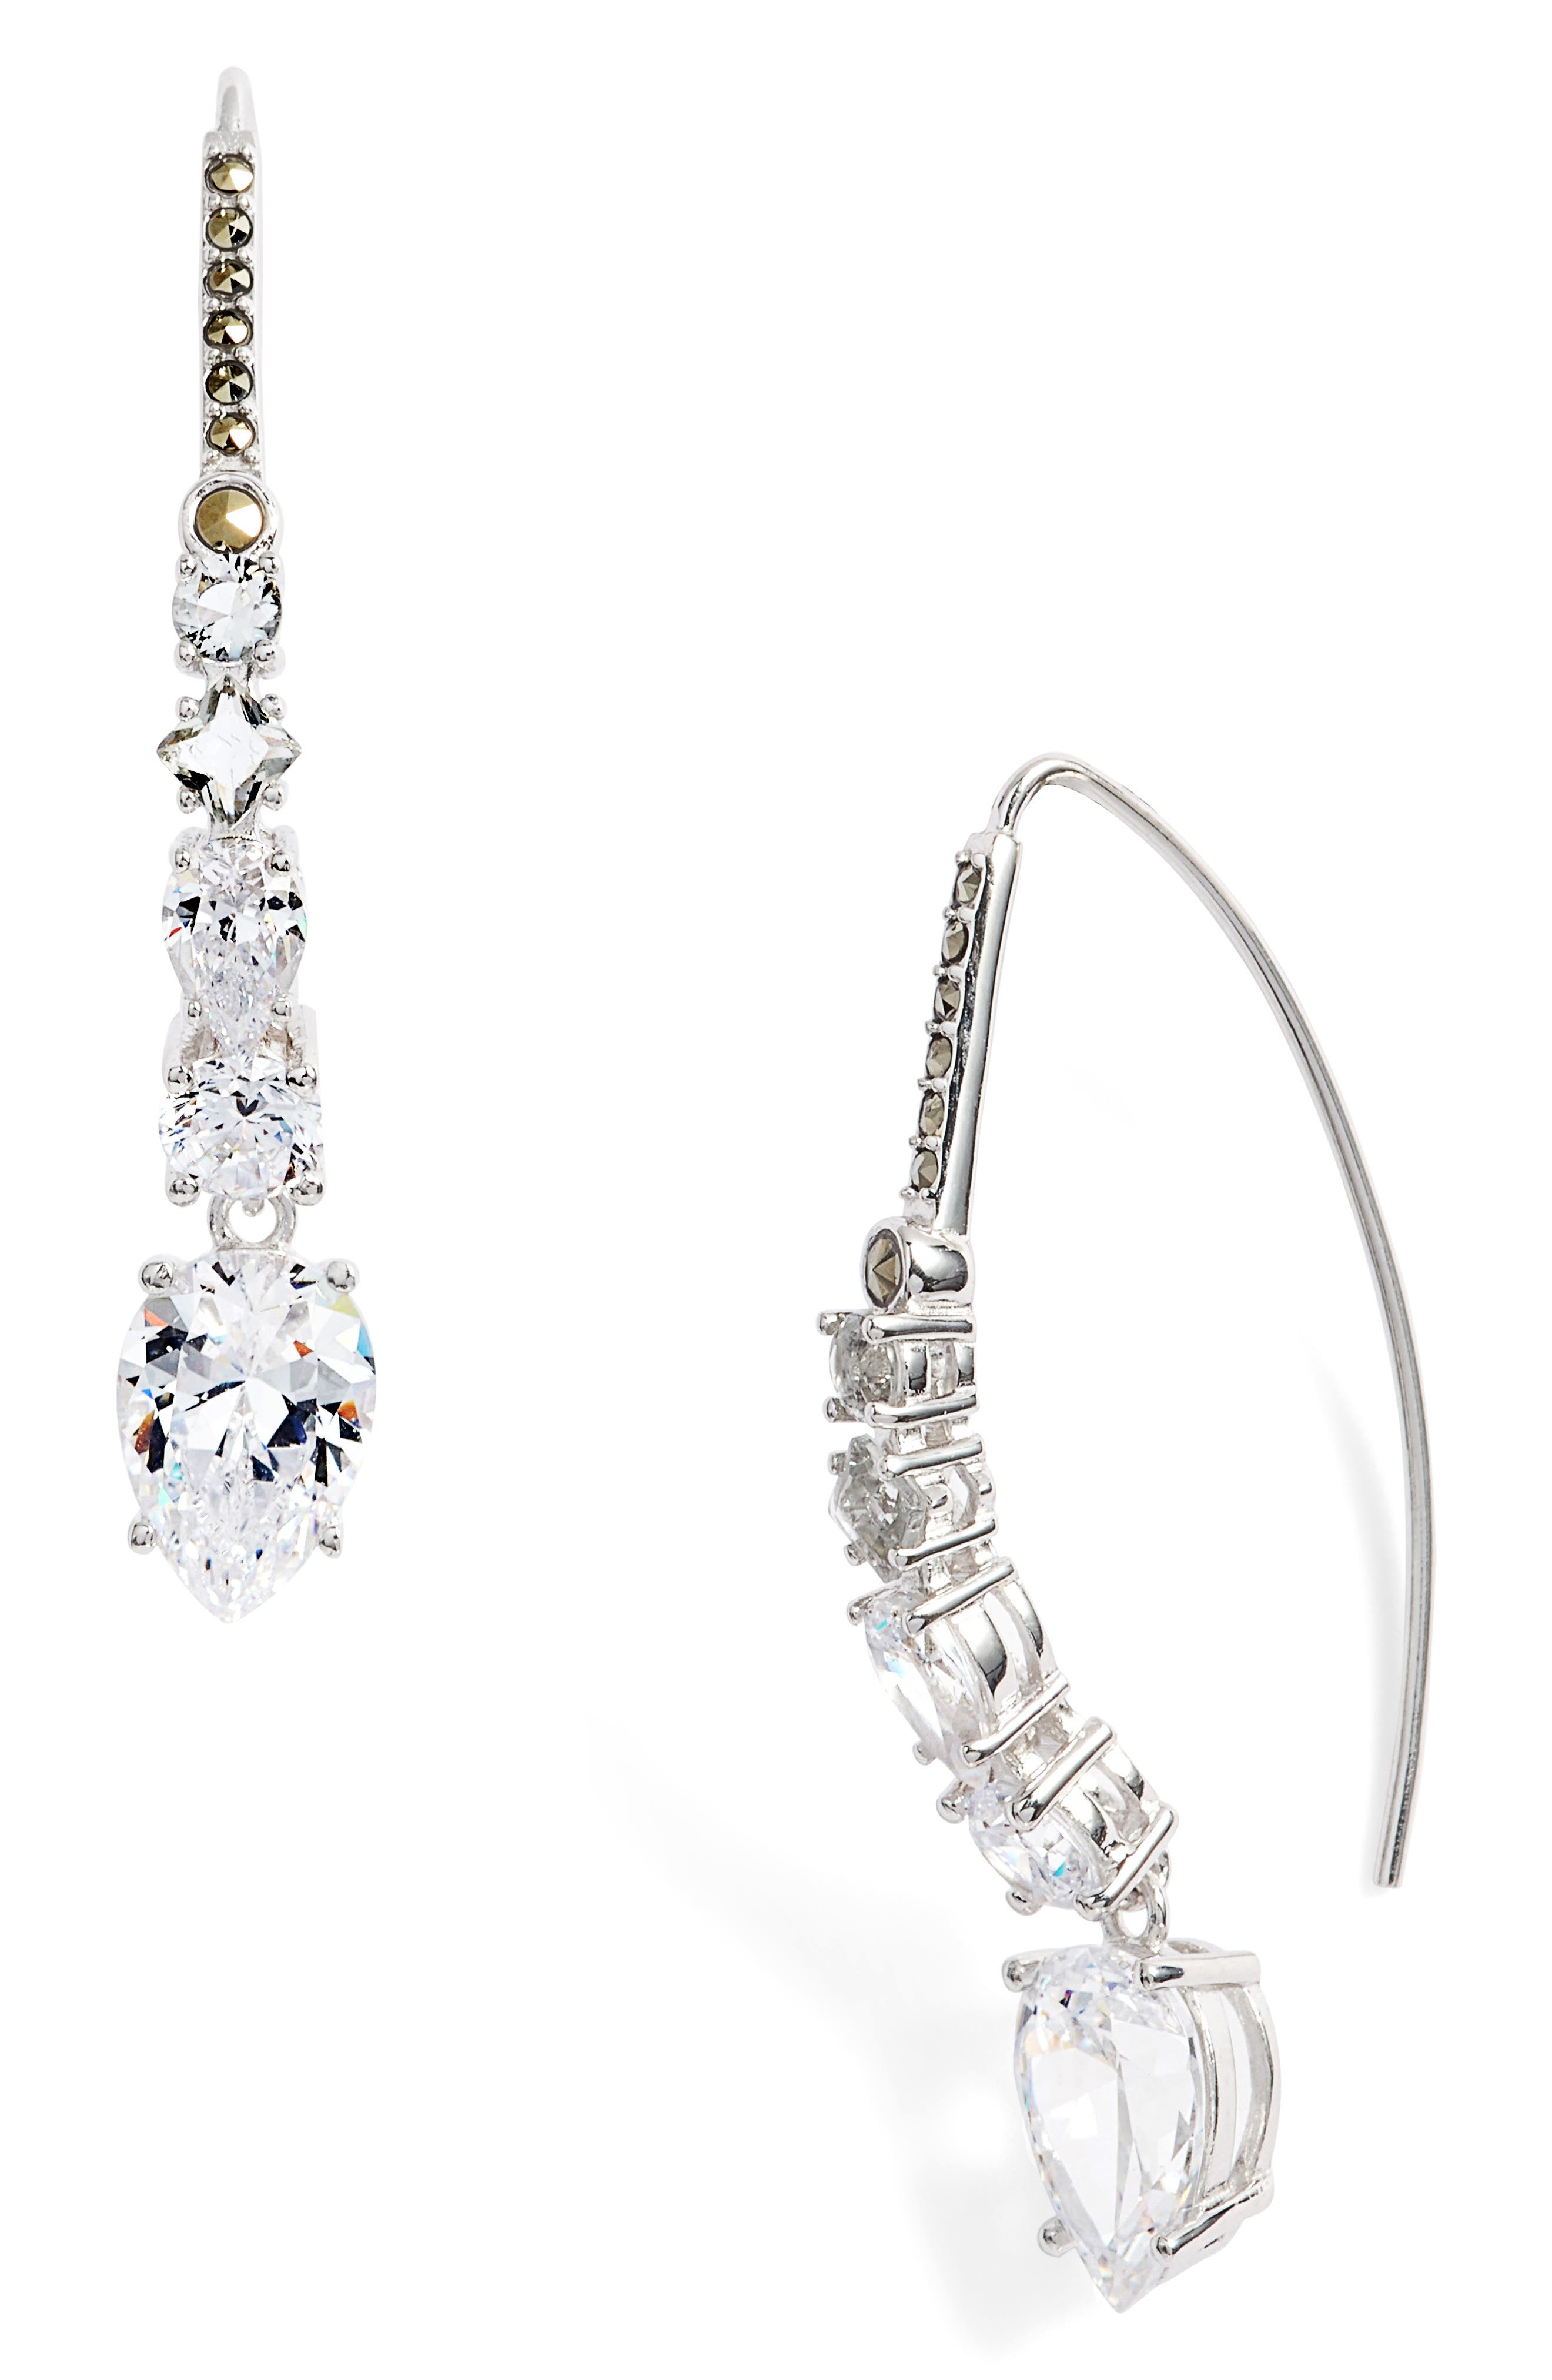 Cubic Zirconia Threader Earrings,                         Main,                         color, Silver